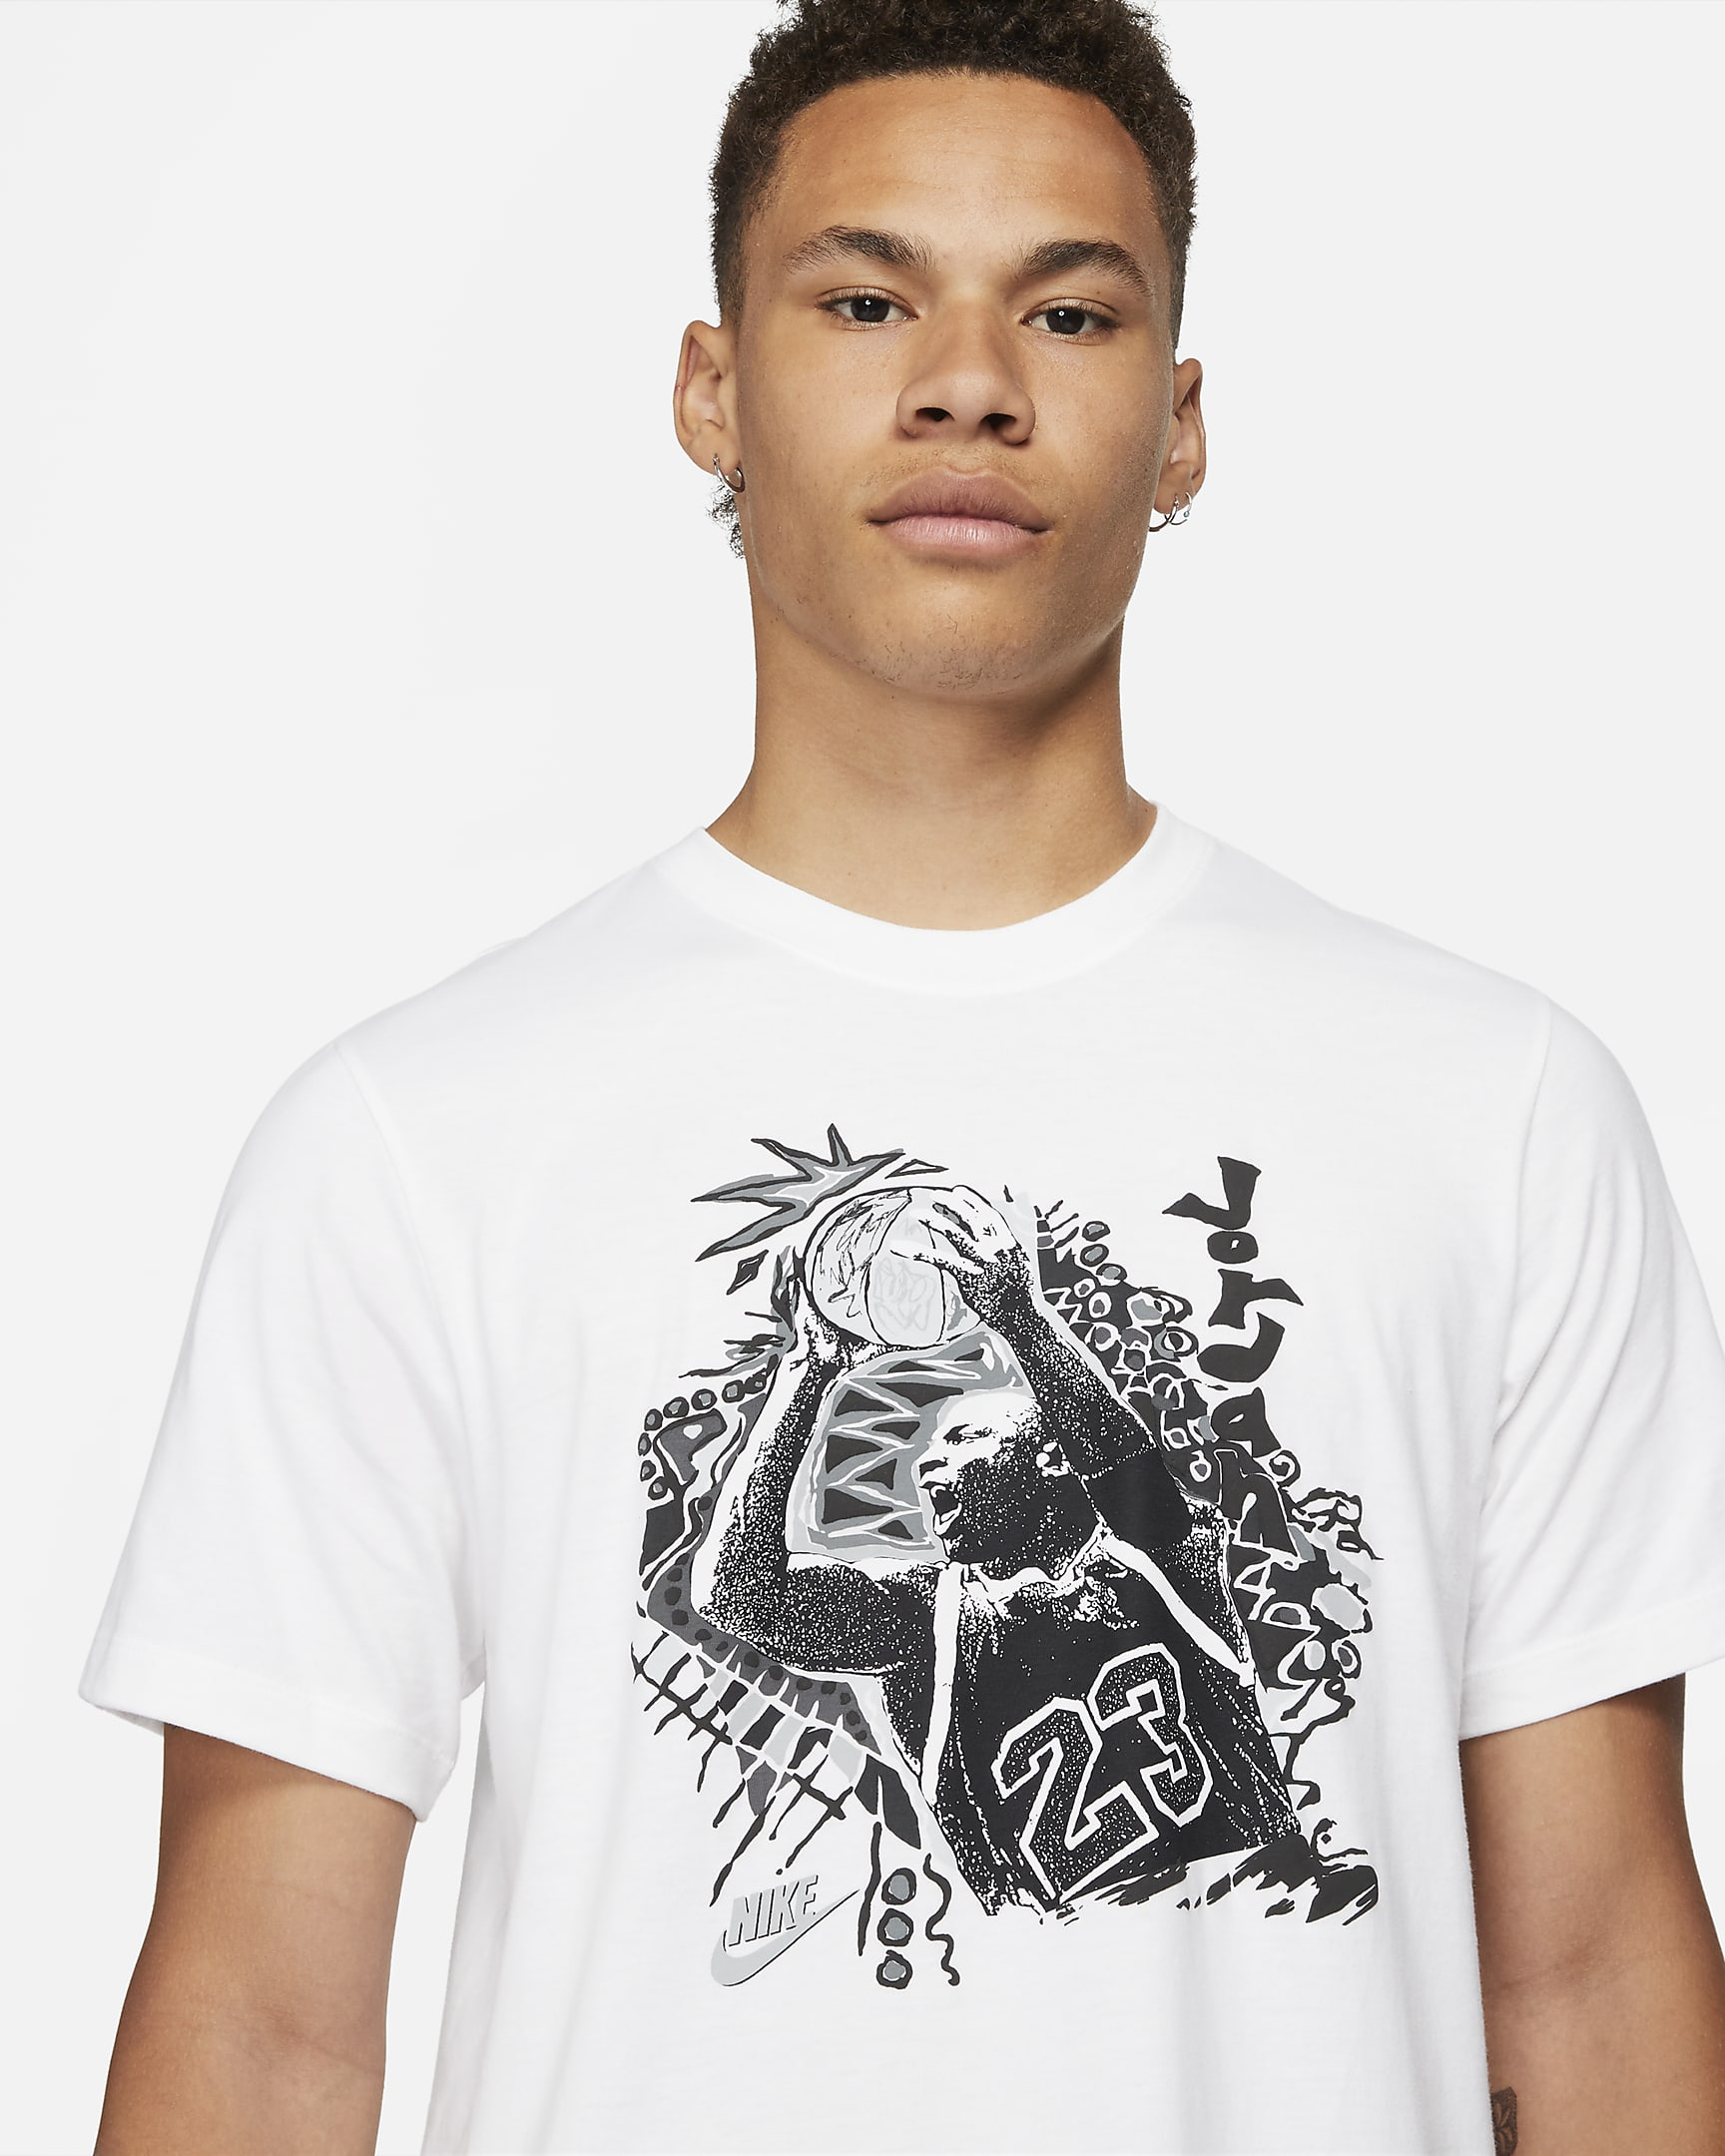 jordan-vintage-mens-graphic-t-shirt-N42Lh8-1.png